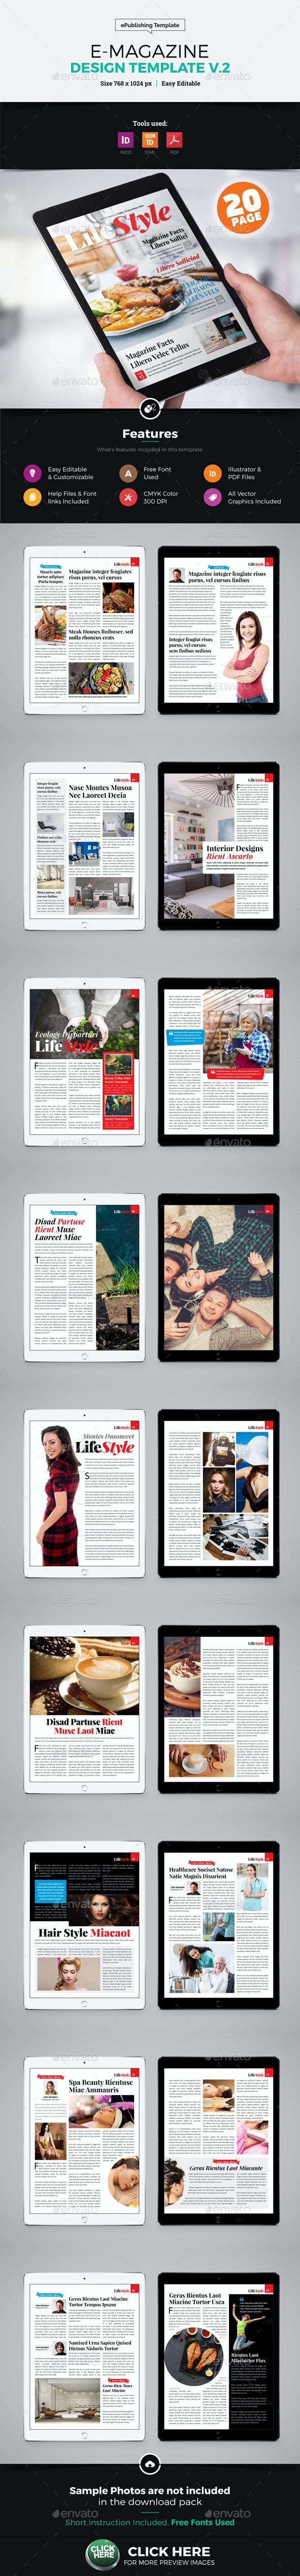 E-Magazine Design v2 - Digital Magazines ePublishing